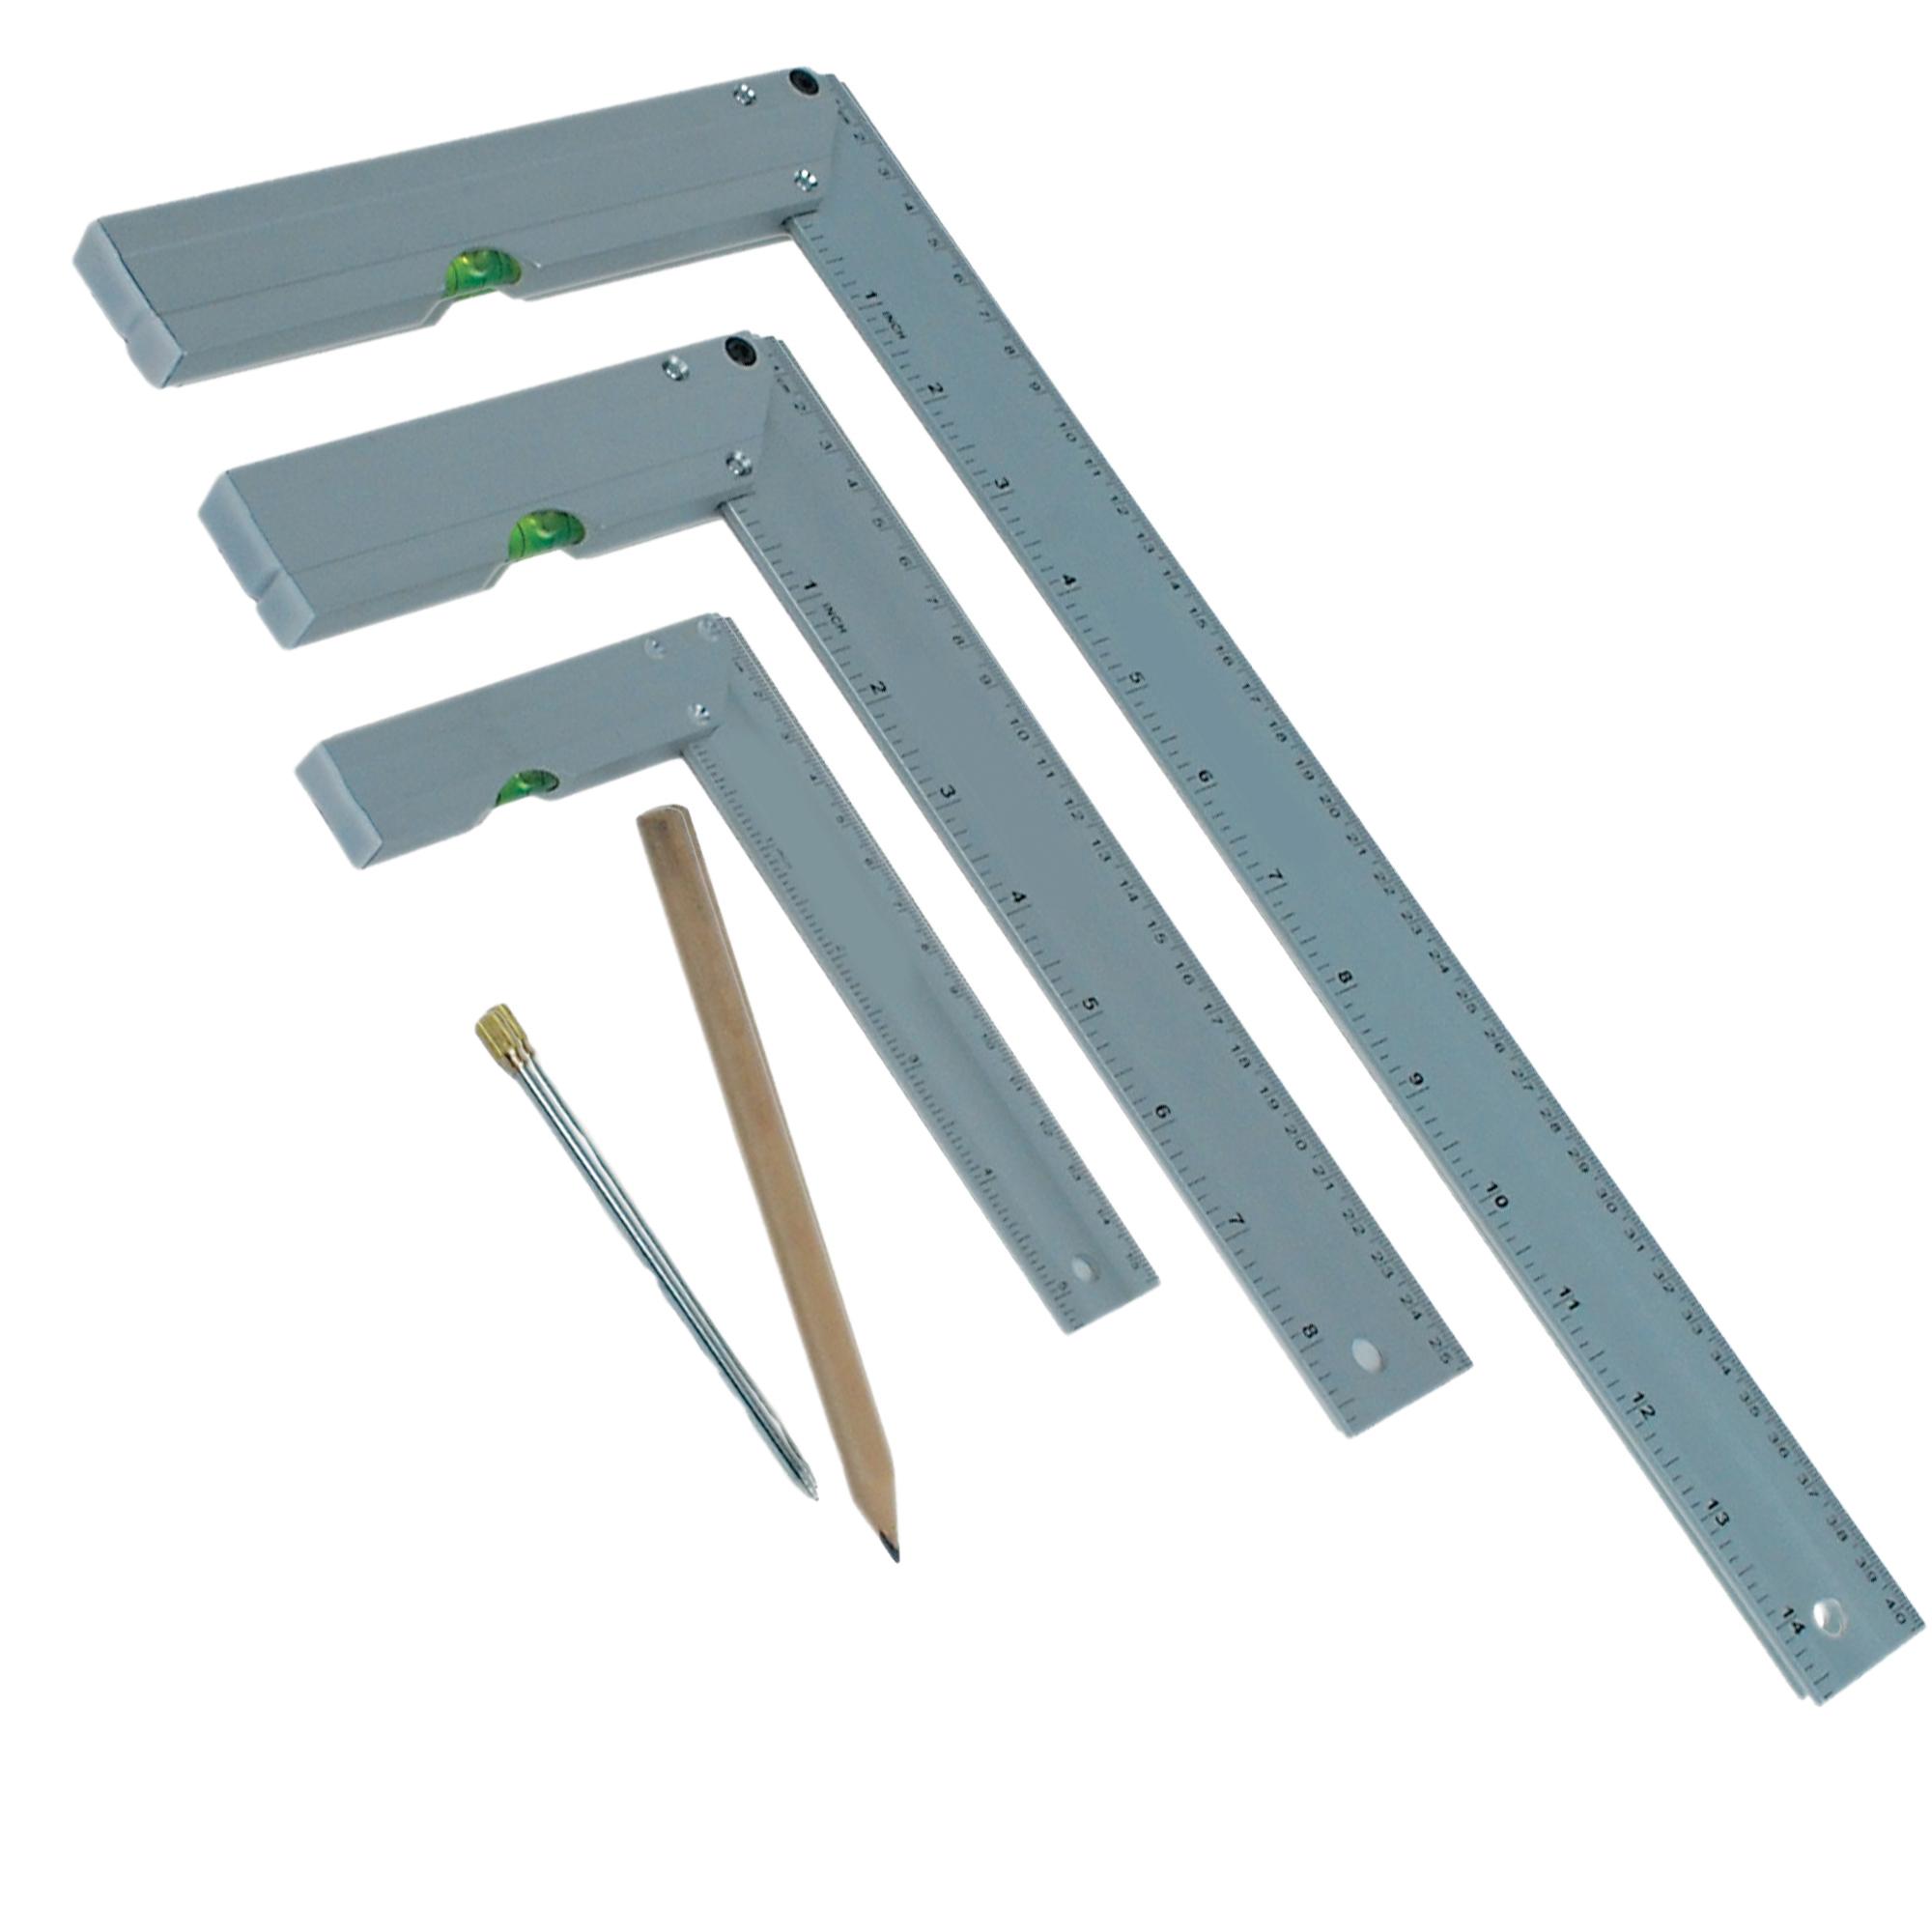 Aluminium Anschlagwinkel-Set inkl. Anreißer